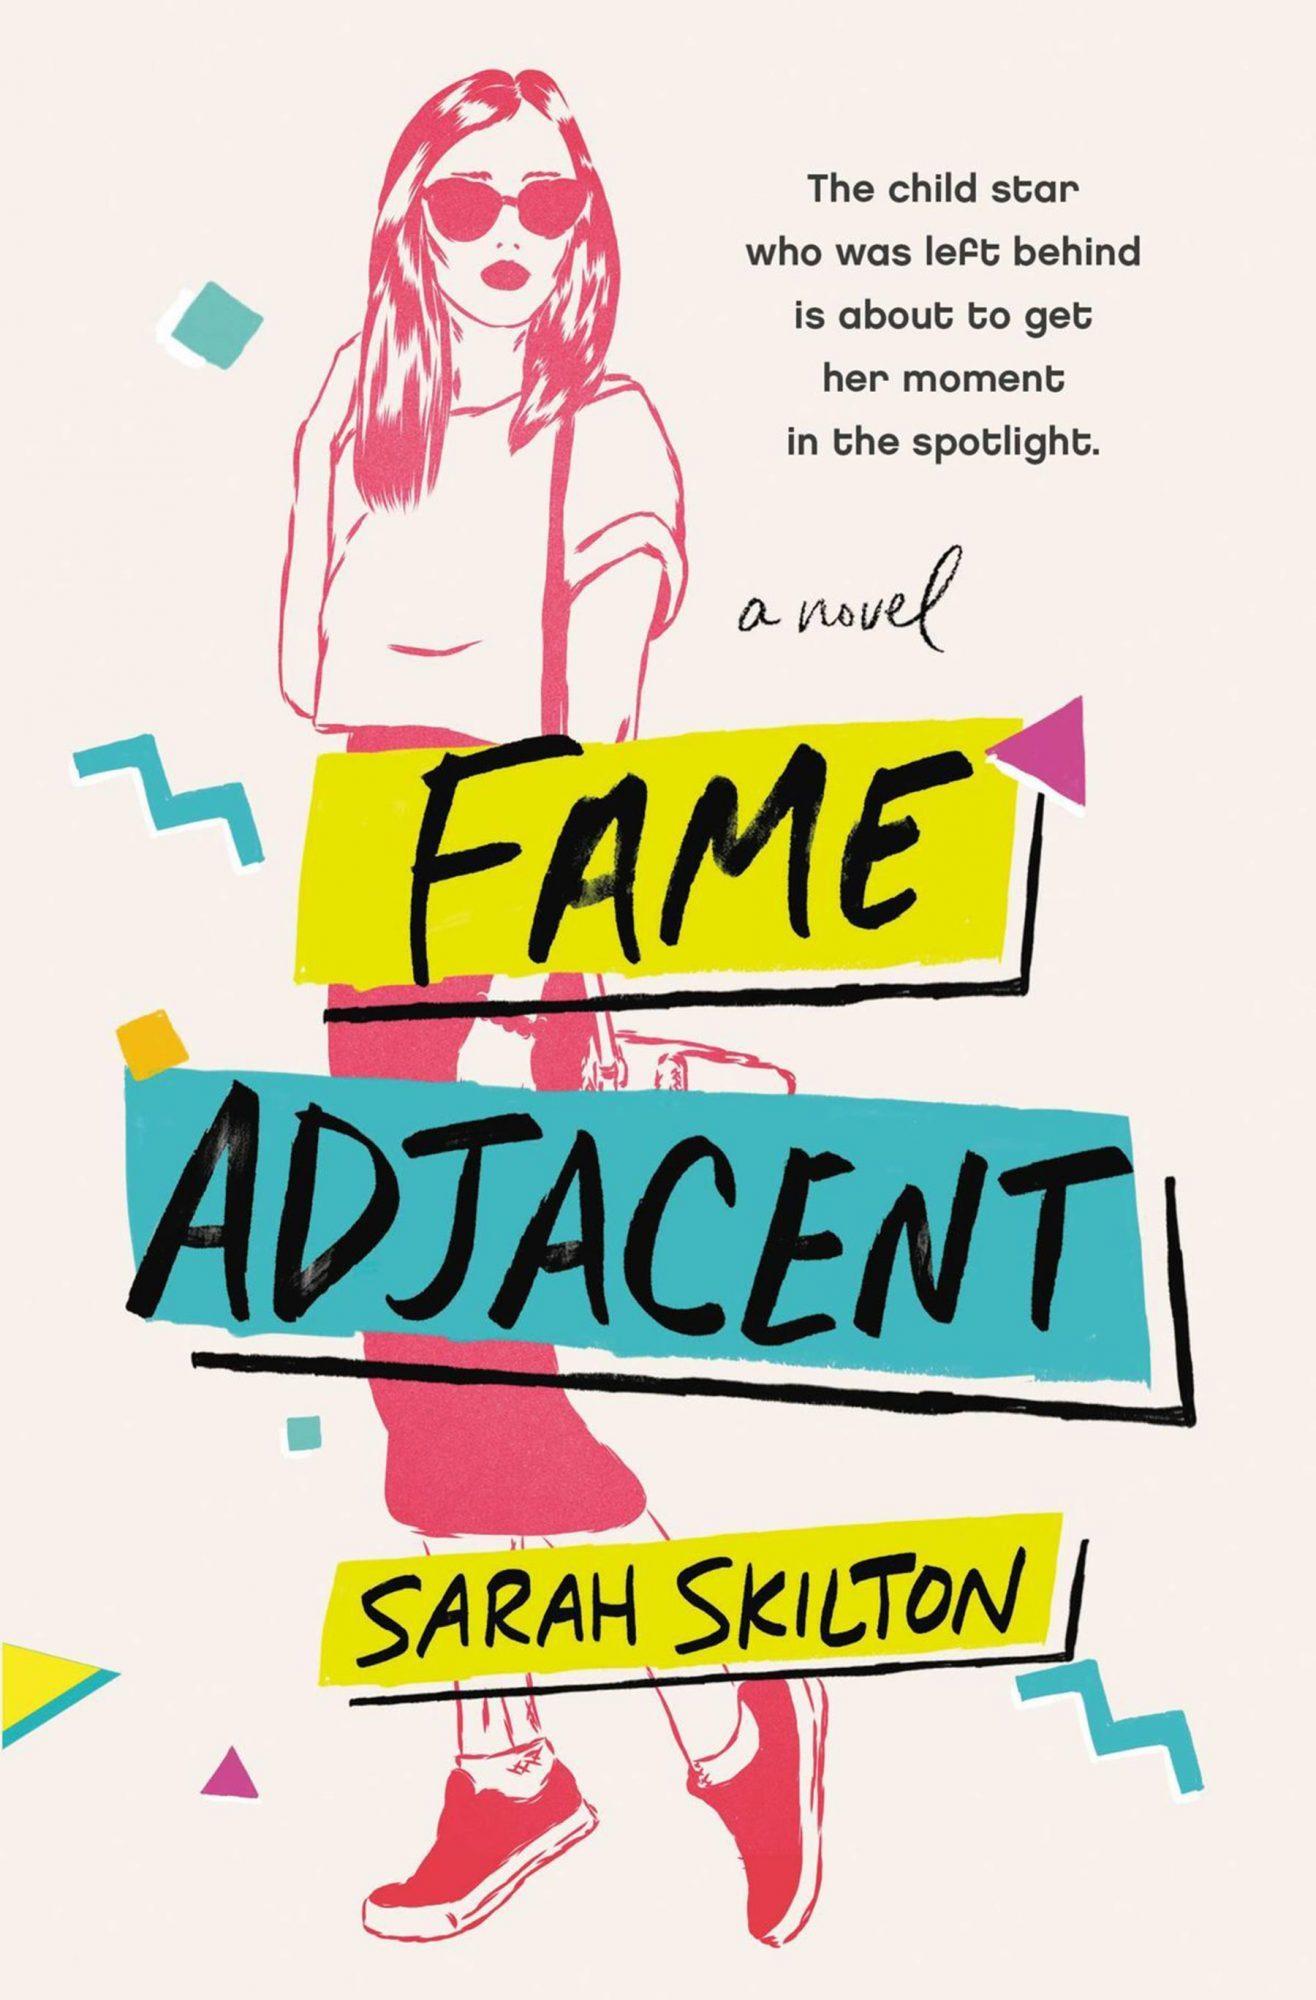 Fame-Adjacent-by-Sarah-Skilton